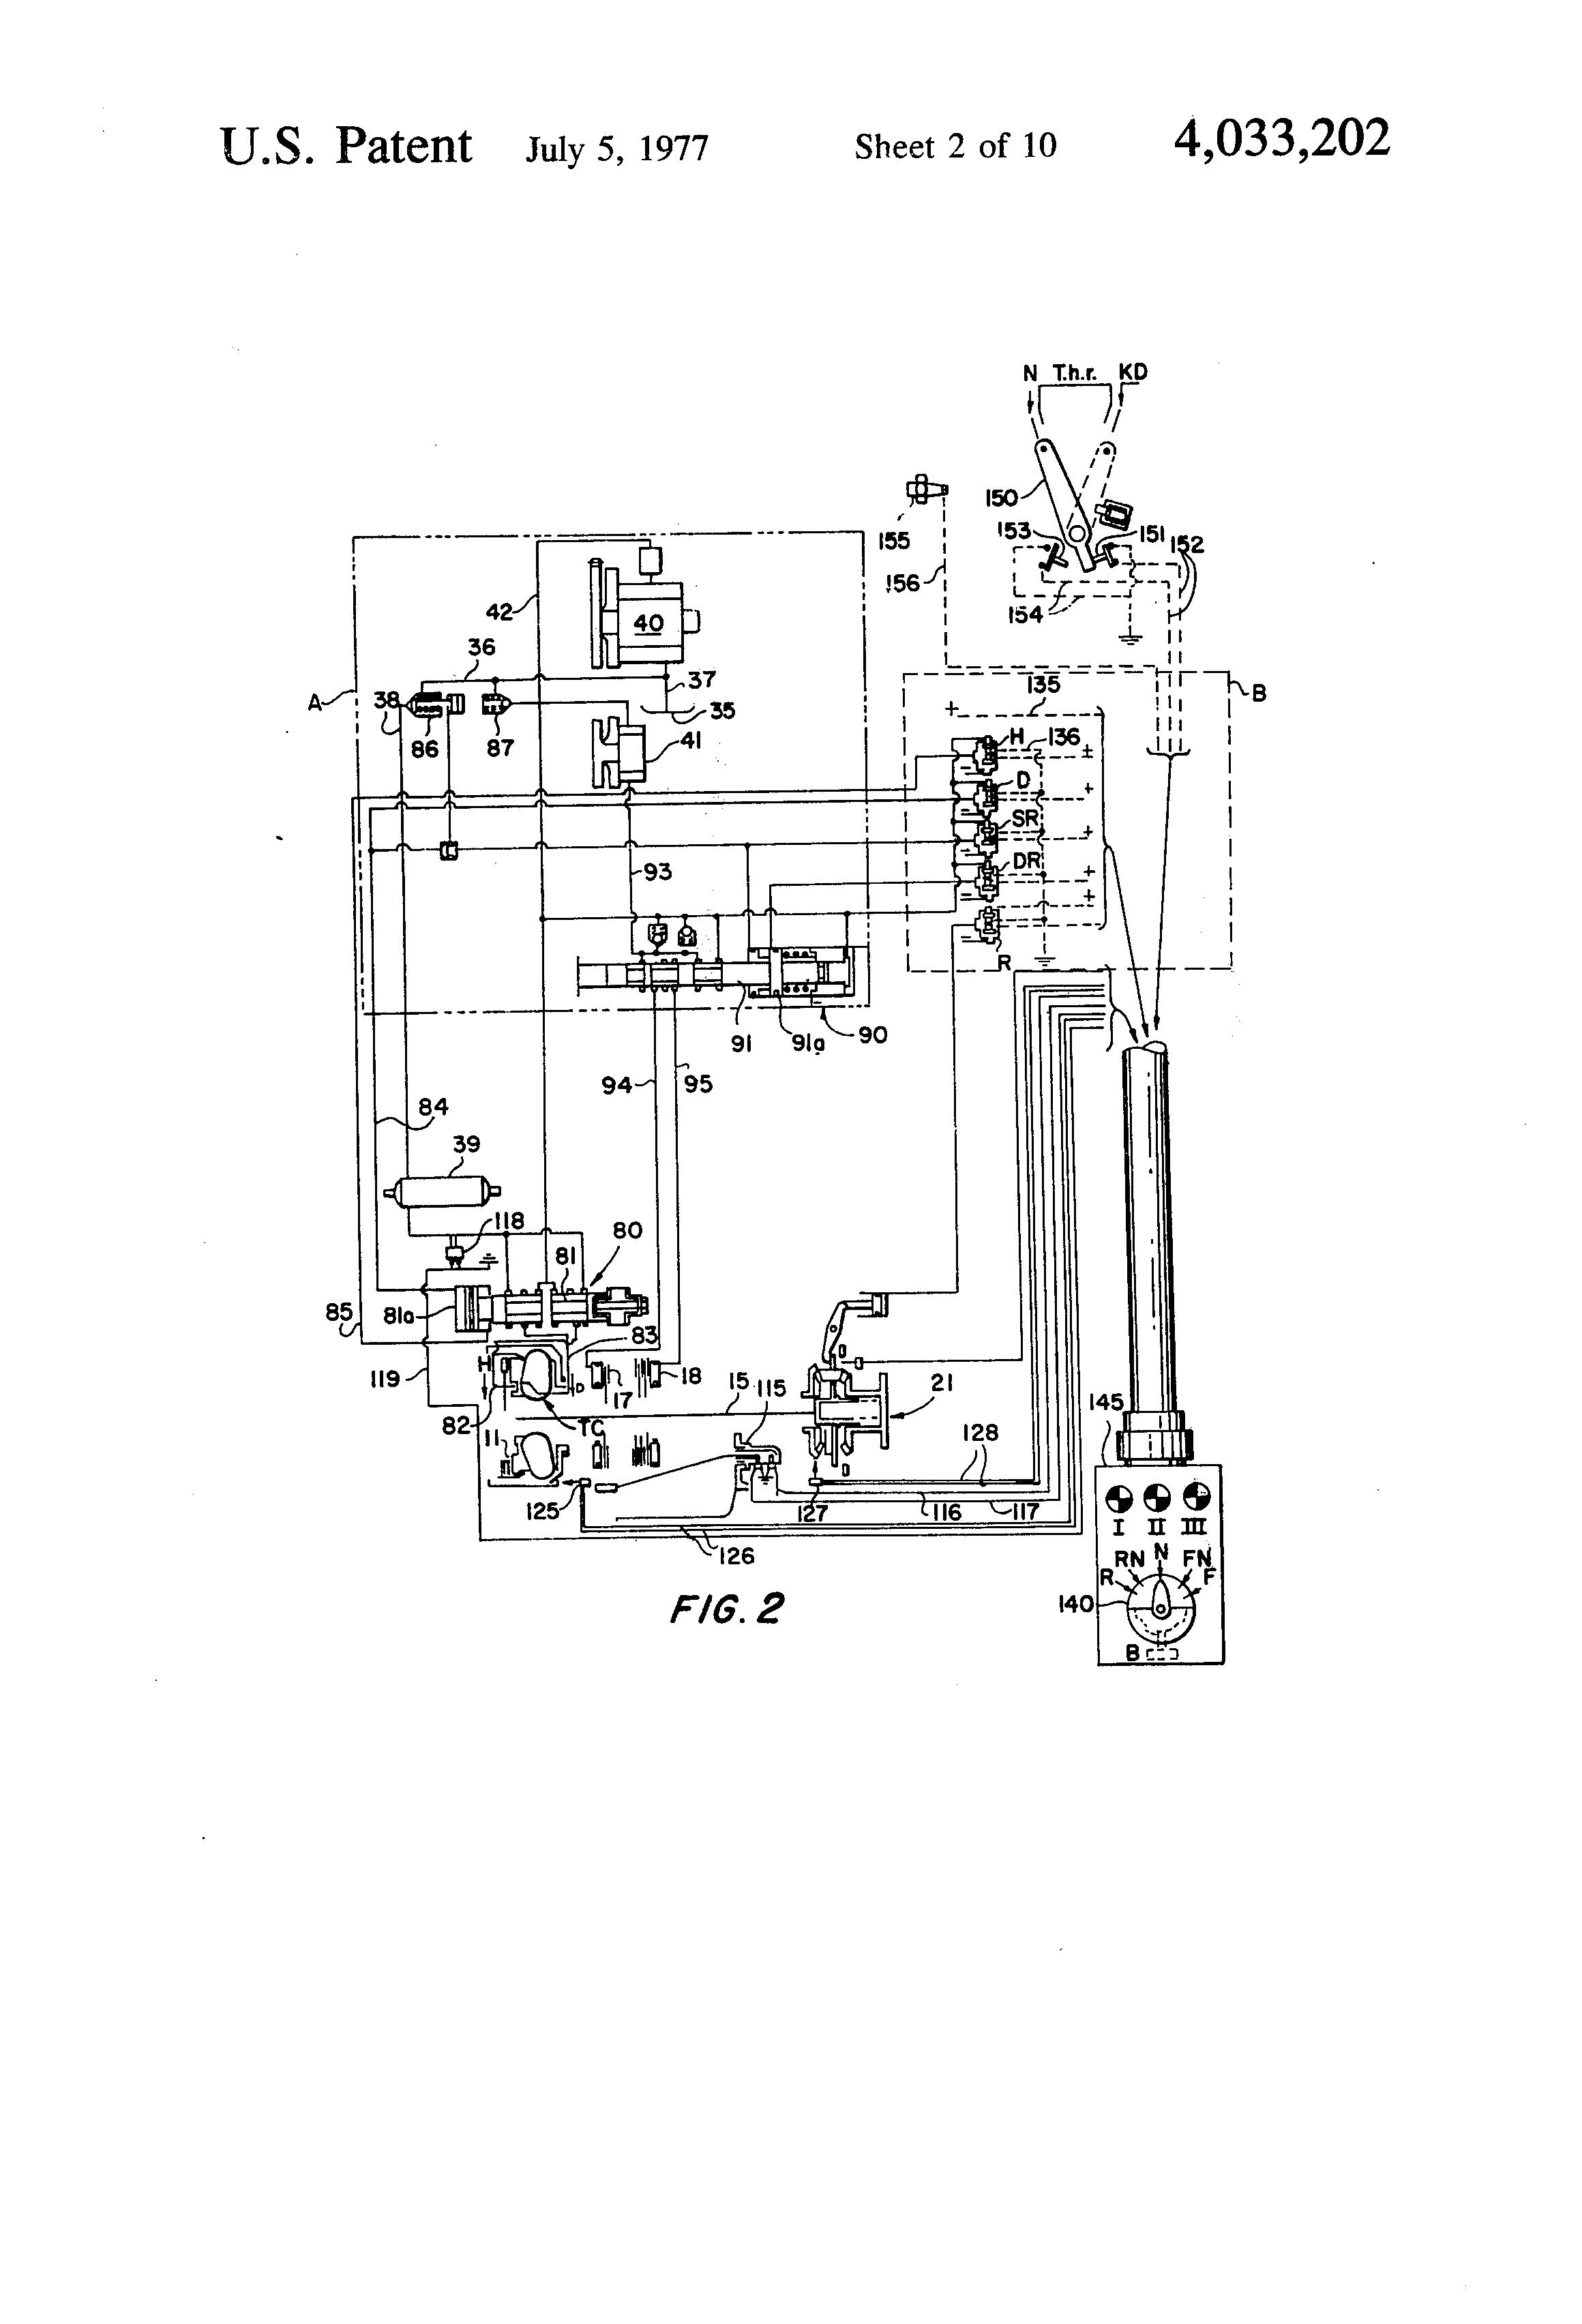 [QMVU_8575]  Lima Generator Wiring Diagram - 2002 Road King Wiring Diagram for Wiring  Diagram Schematics   Denyo Generator Wiring Diagram      Wiring Diagram Schematics